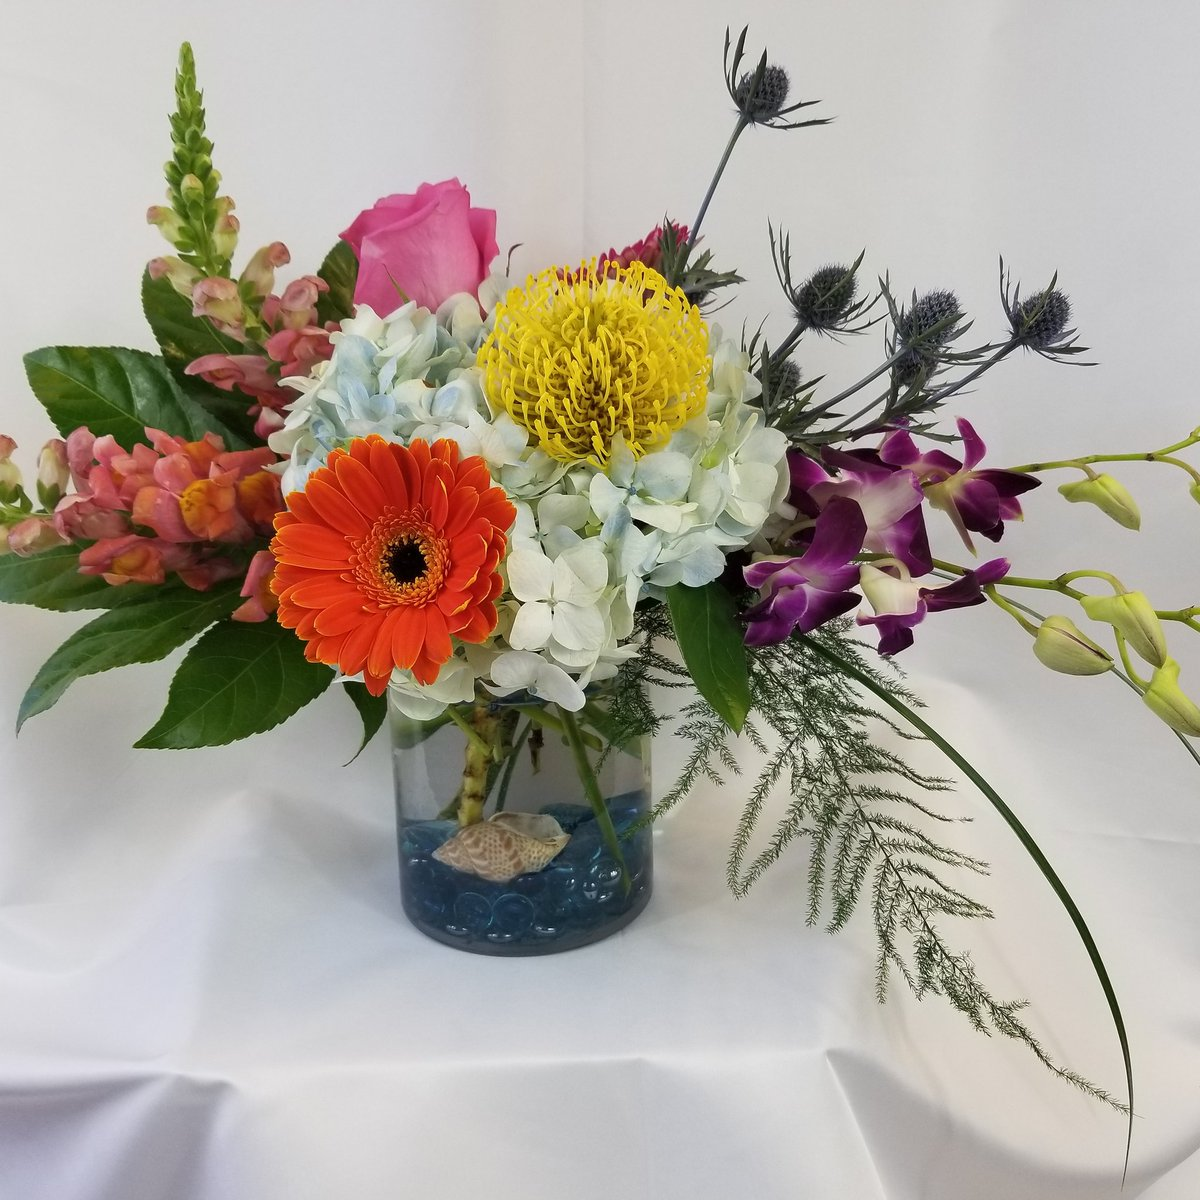 Mount Olivet Flowers Mtolivetflowers Twitter